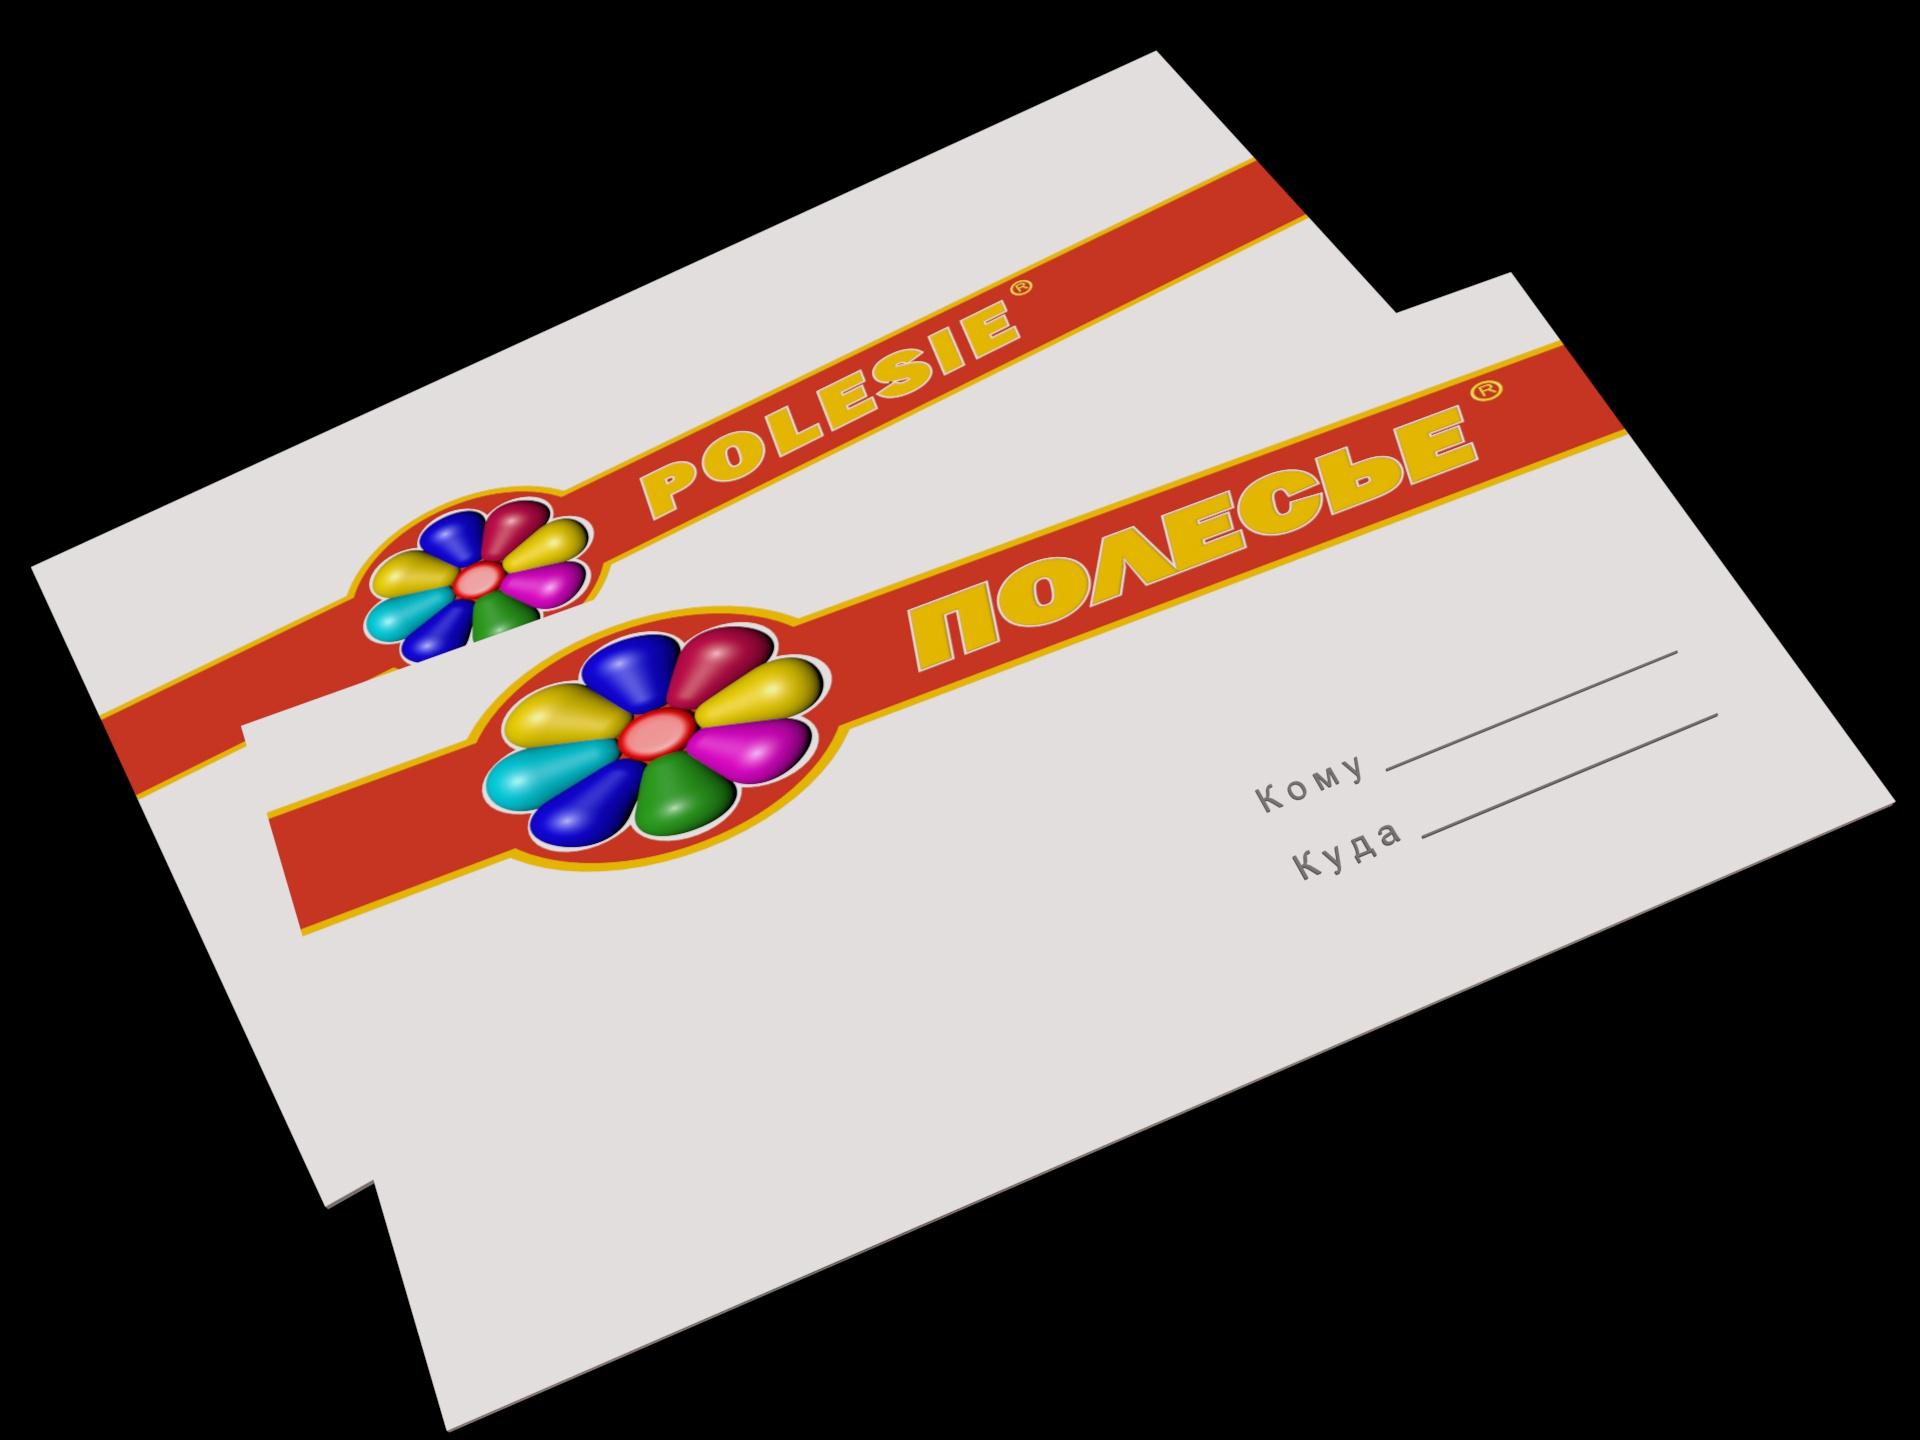 Разработка фирменного стиля на основании готового логотипа фото f_1995ab2a0059c7f5.jpg